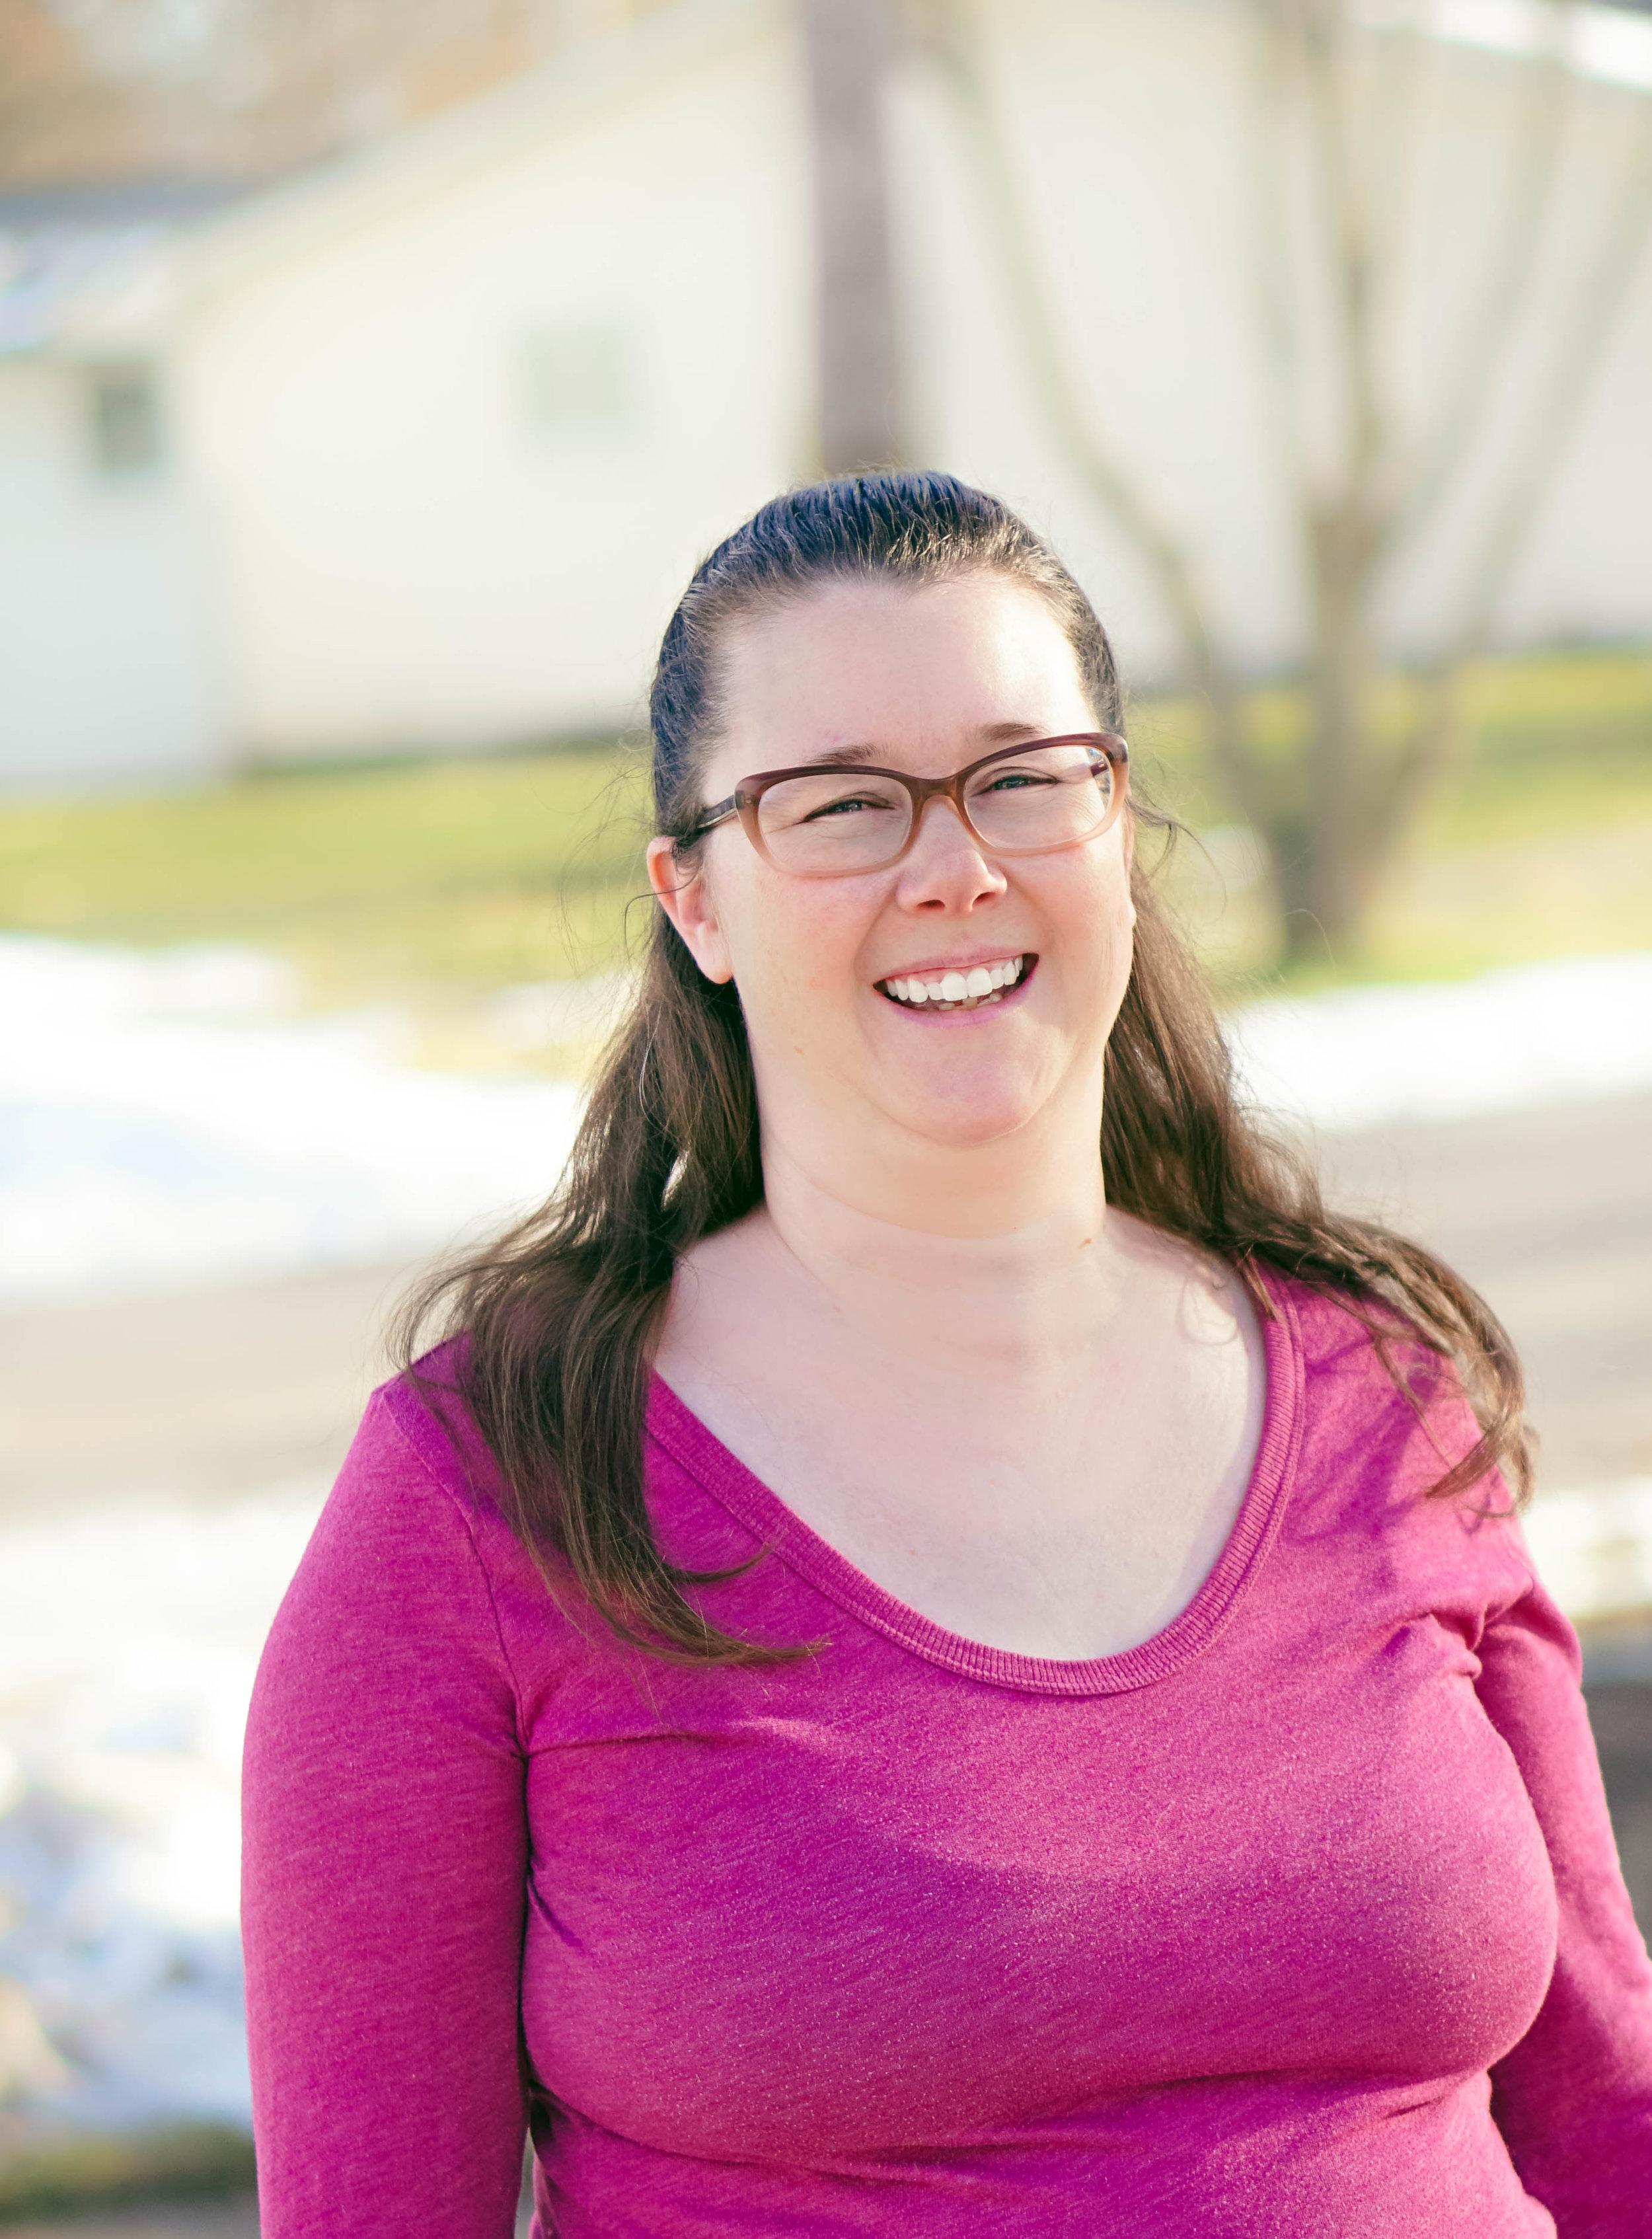 Megan Miklosovic - (Ann Arbor, MI)